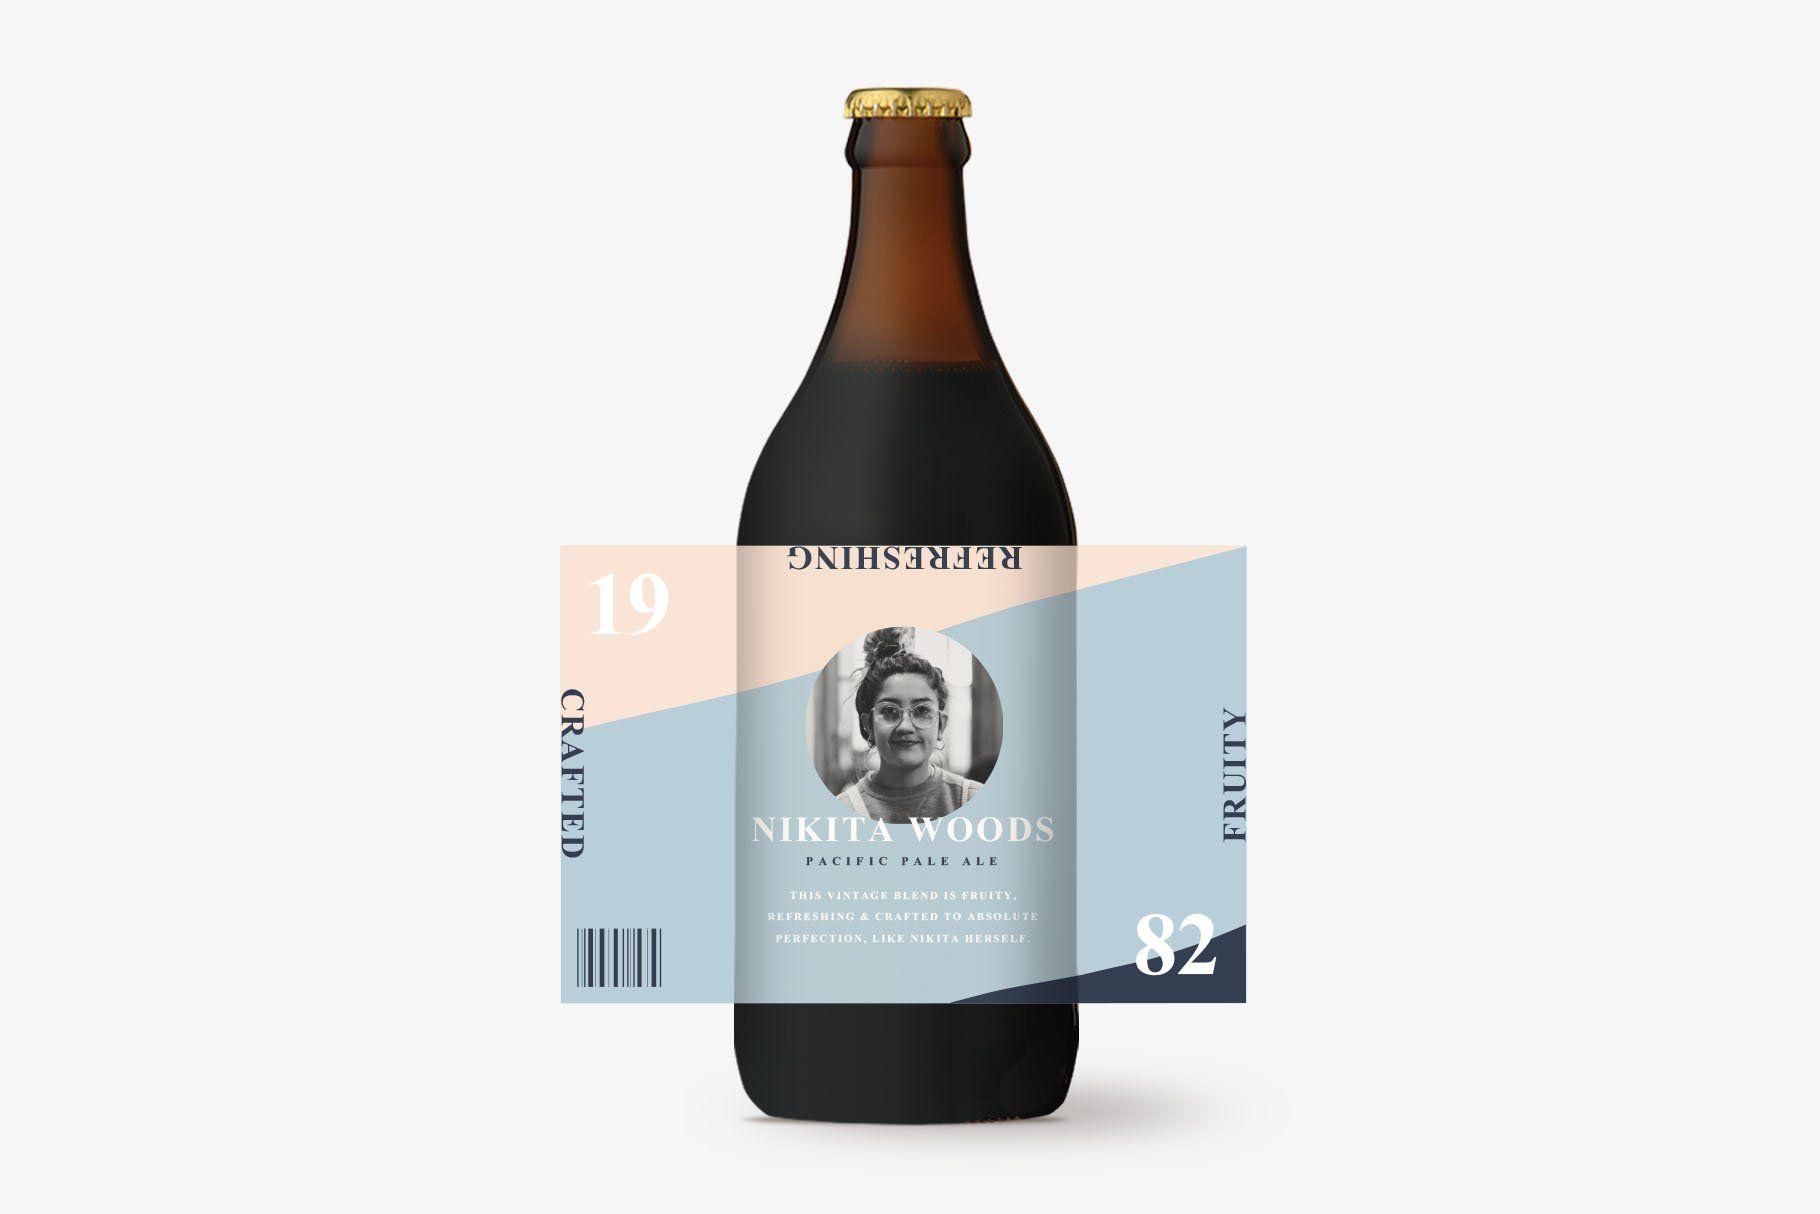 007 Phenomenal Microsoft Word Beer Bottle Label Template Sample Full